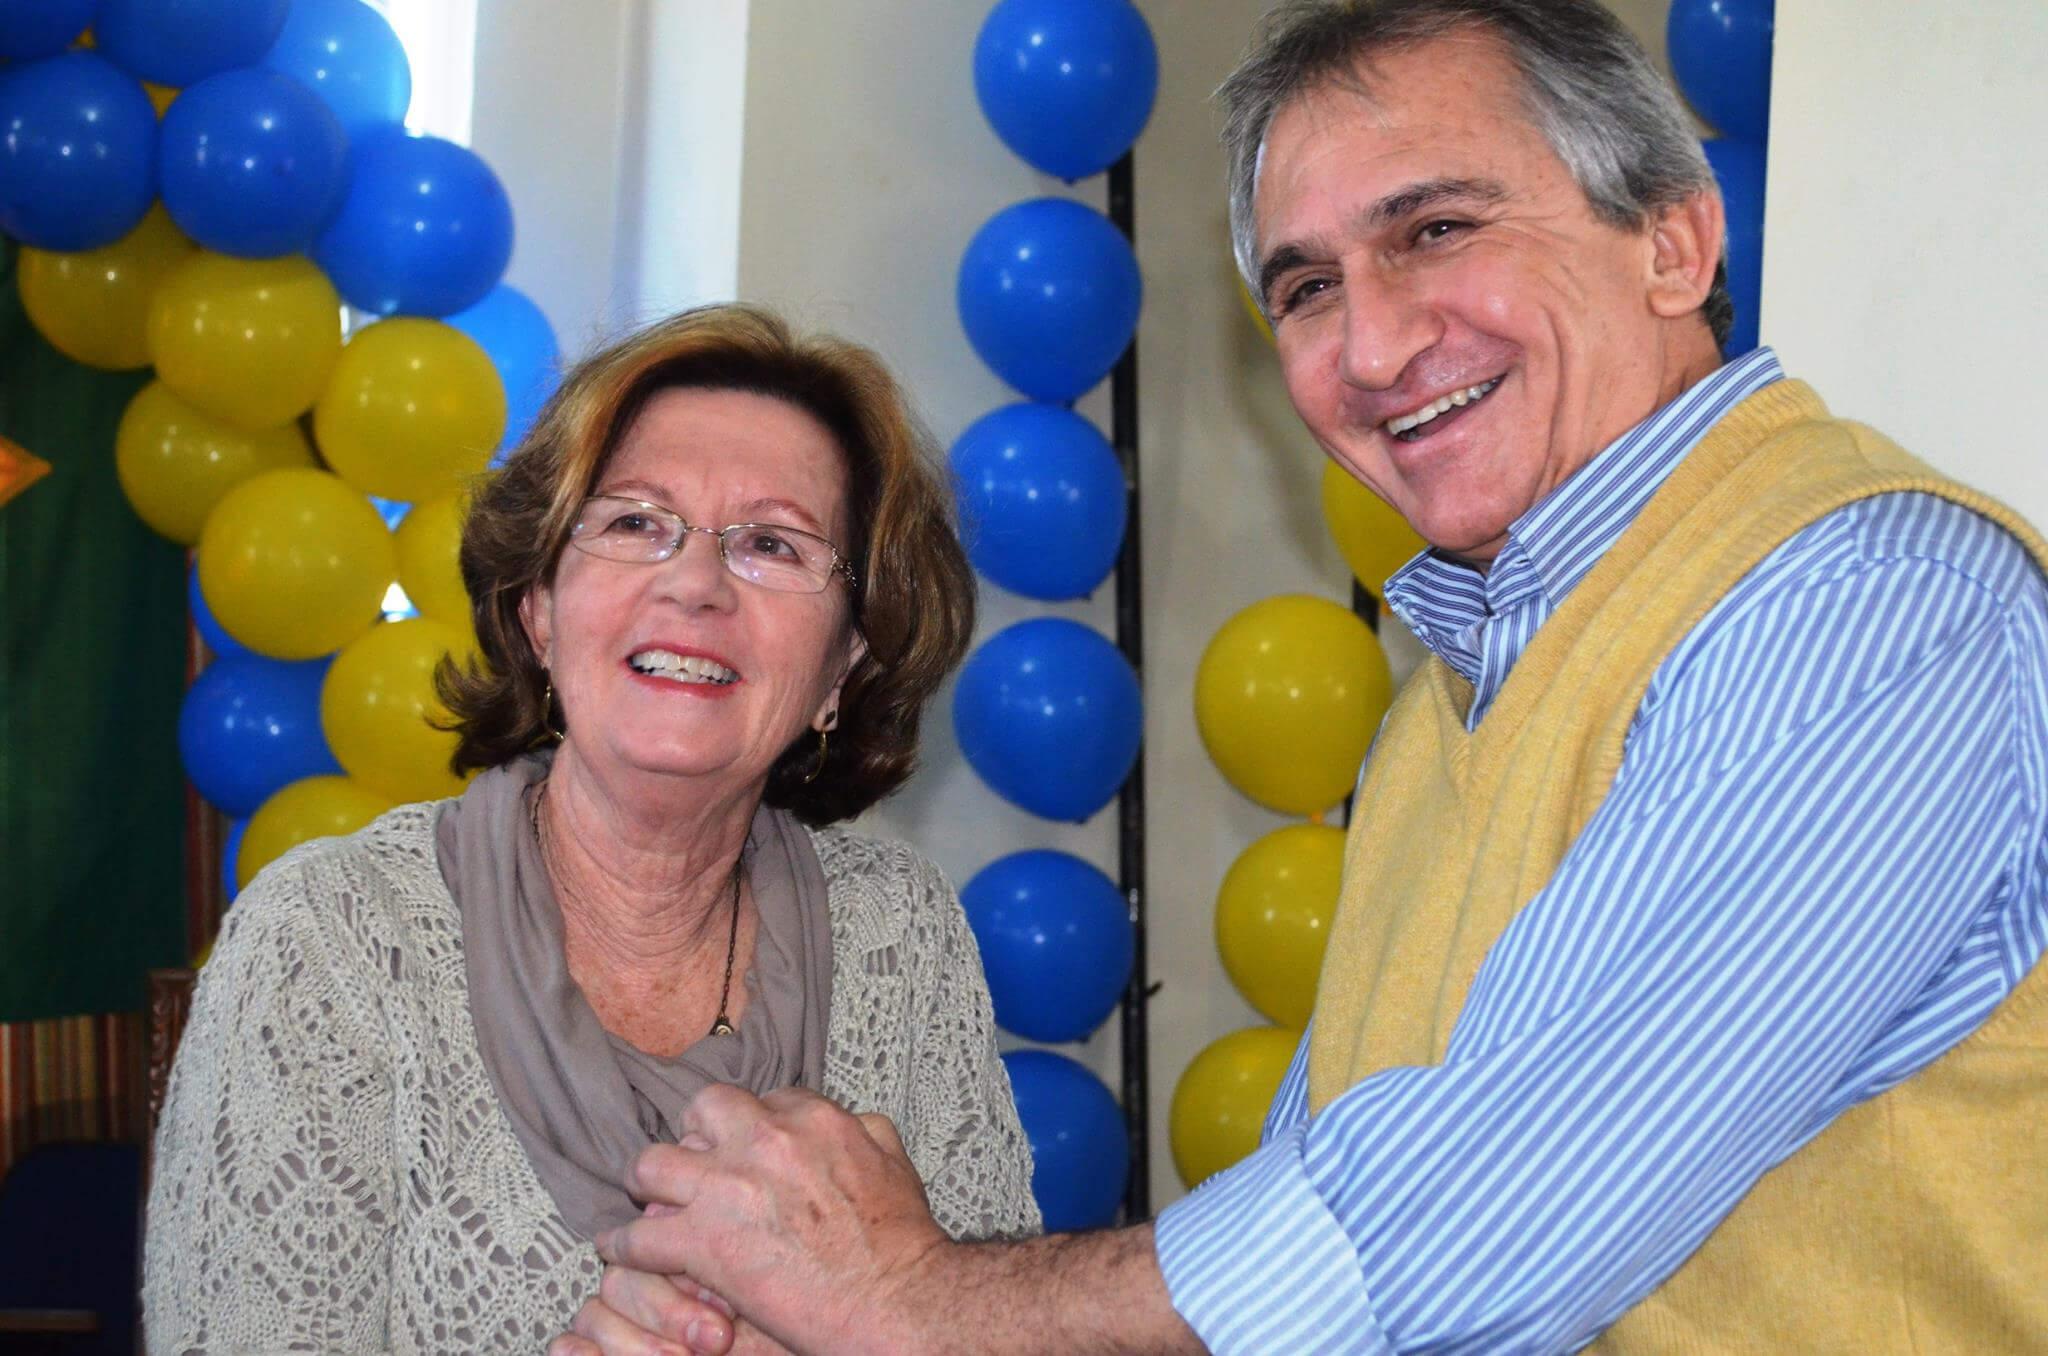 Chico Rafael foi confirmado como candidato a prefeito de Pouso Alegre; Lilian Siqueira deve ser a vice na chapa (Foto: Assessoria / Douglas Vasconcelos)